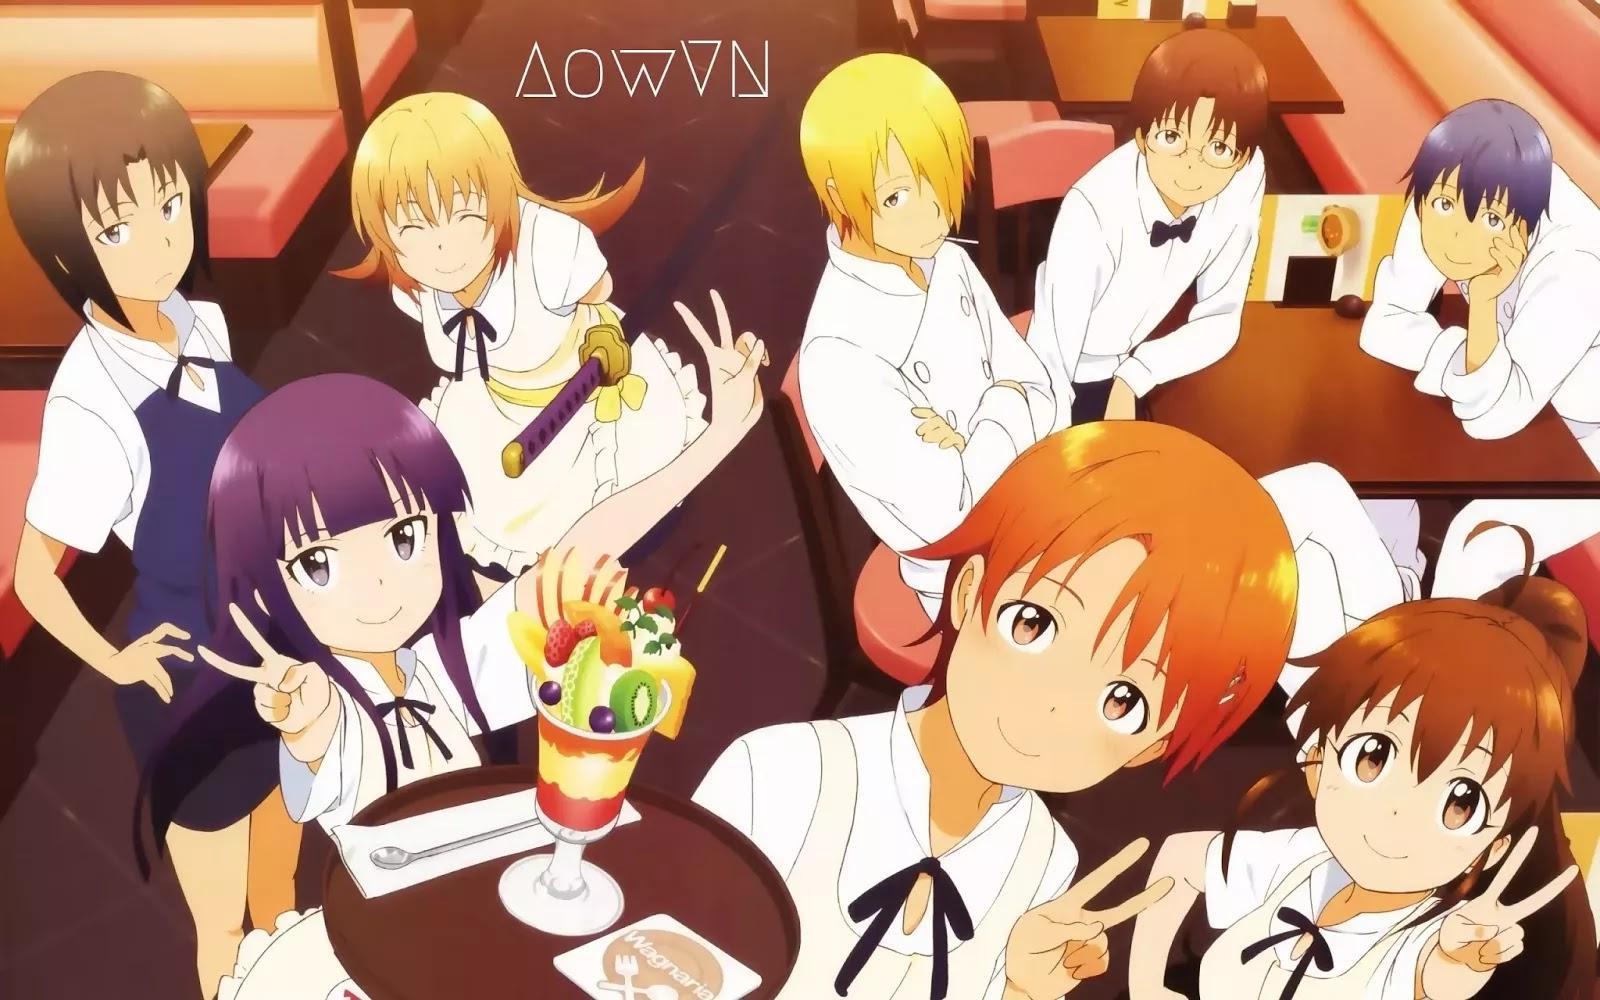 AowVN.org min%2B%25285%2529 - [ Anime 3gp Mp4 ] Working !!! SS1 + SS2 + SS3 + WWW.Working  | Vietsub - Tuyệt Hay